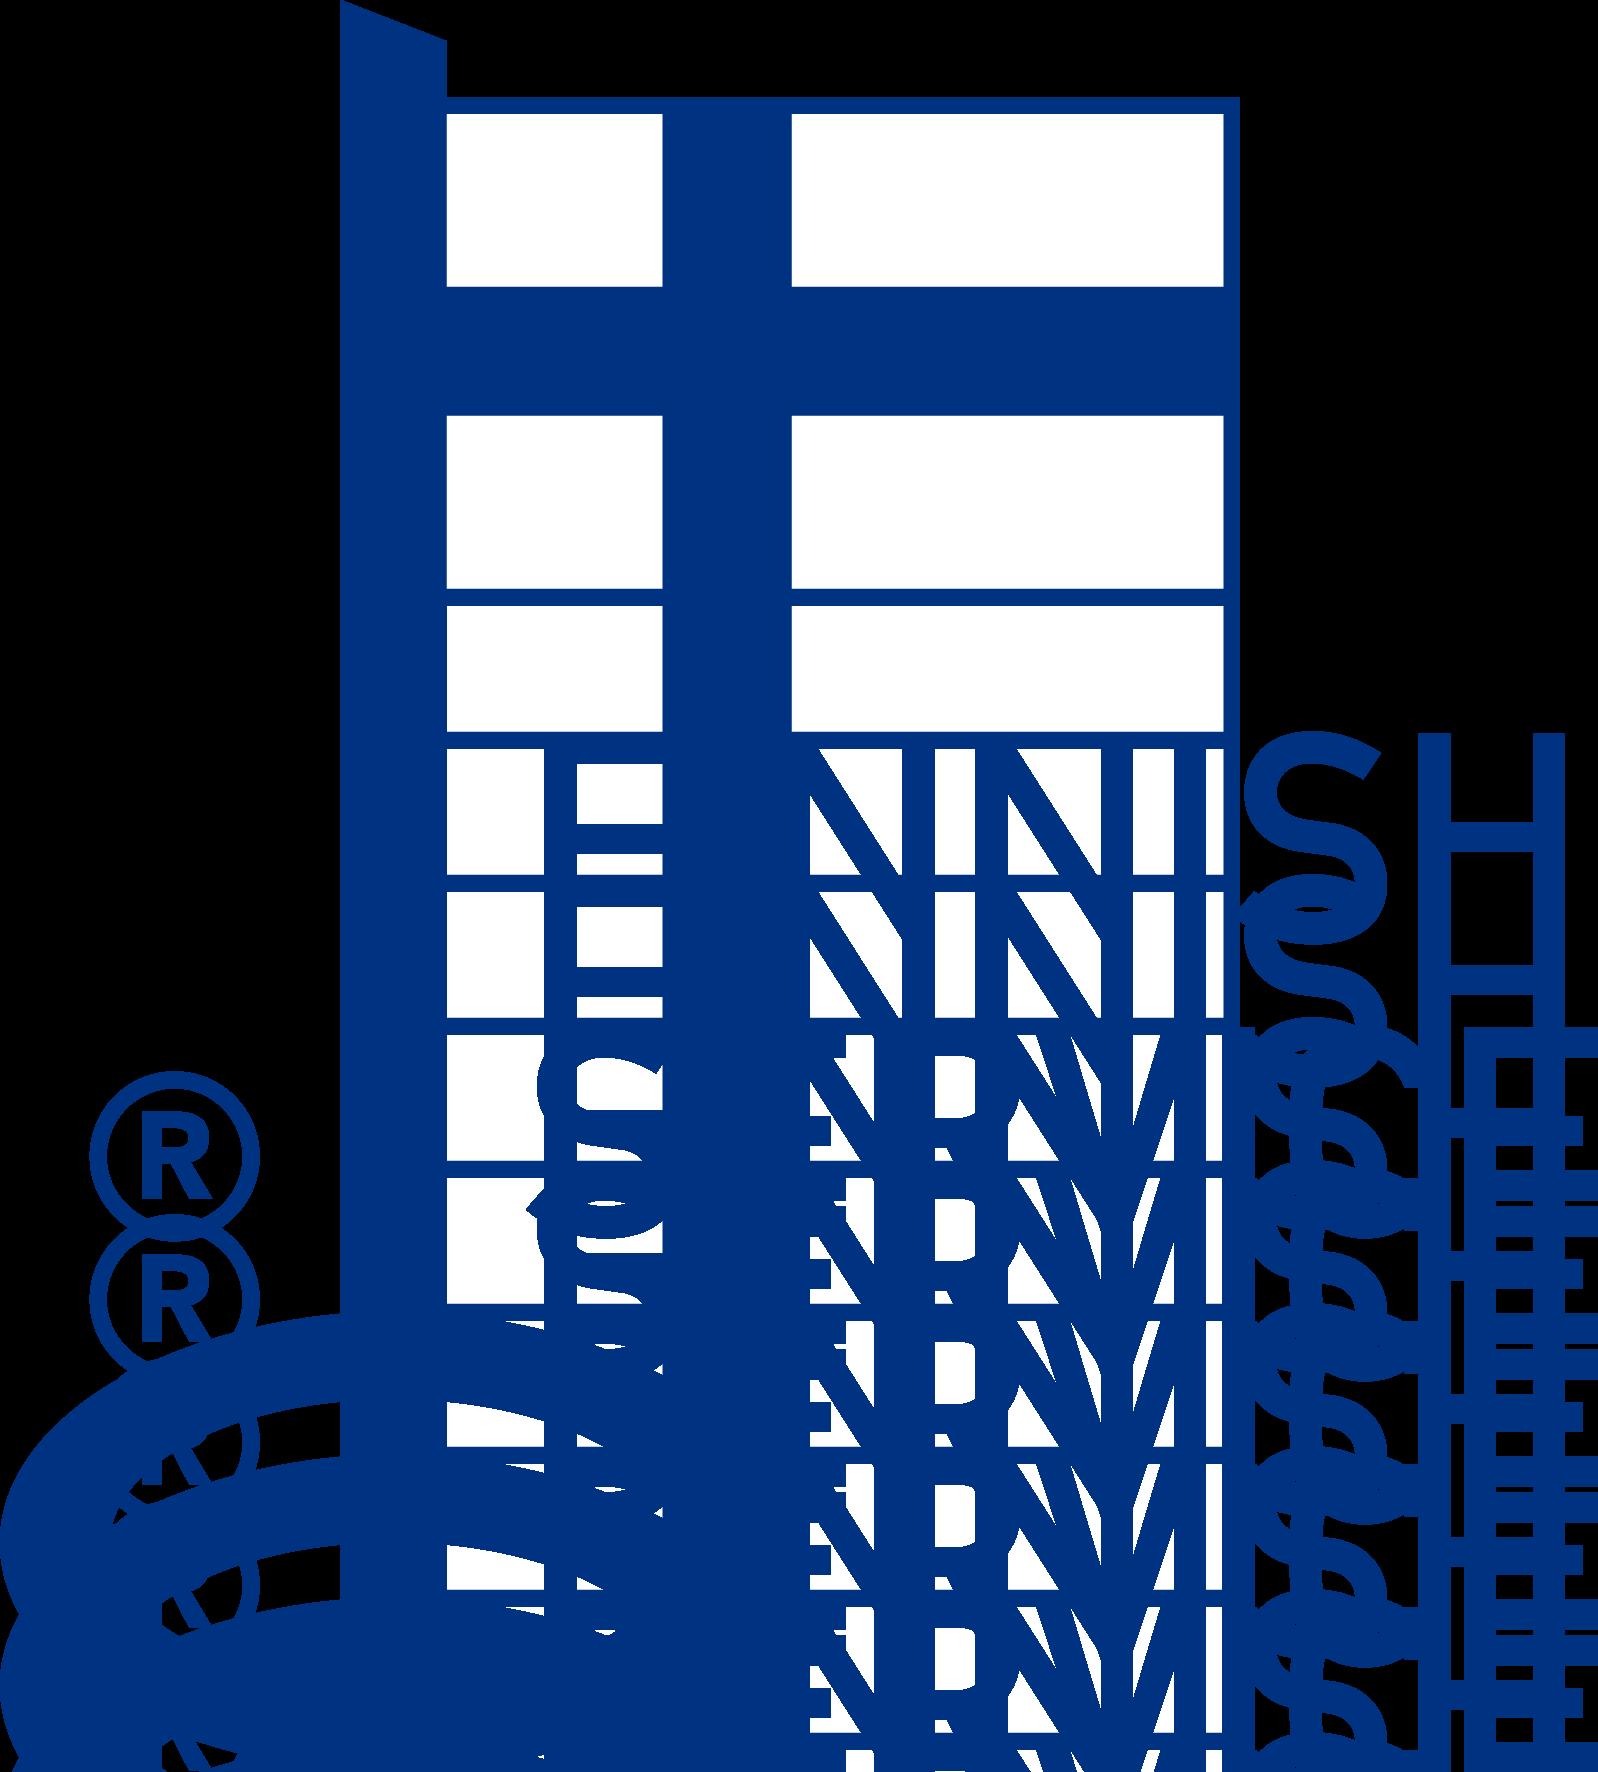 Finnish Service logo